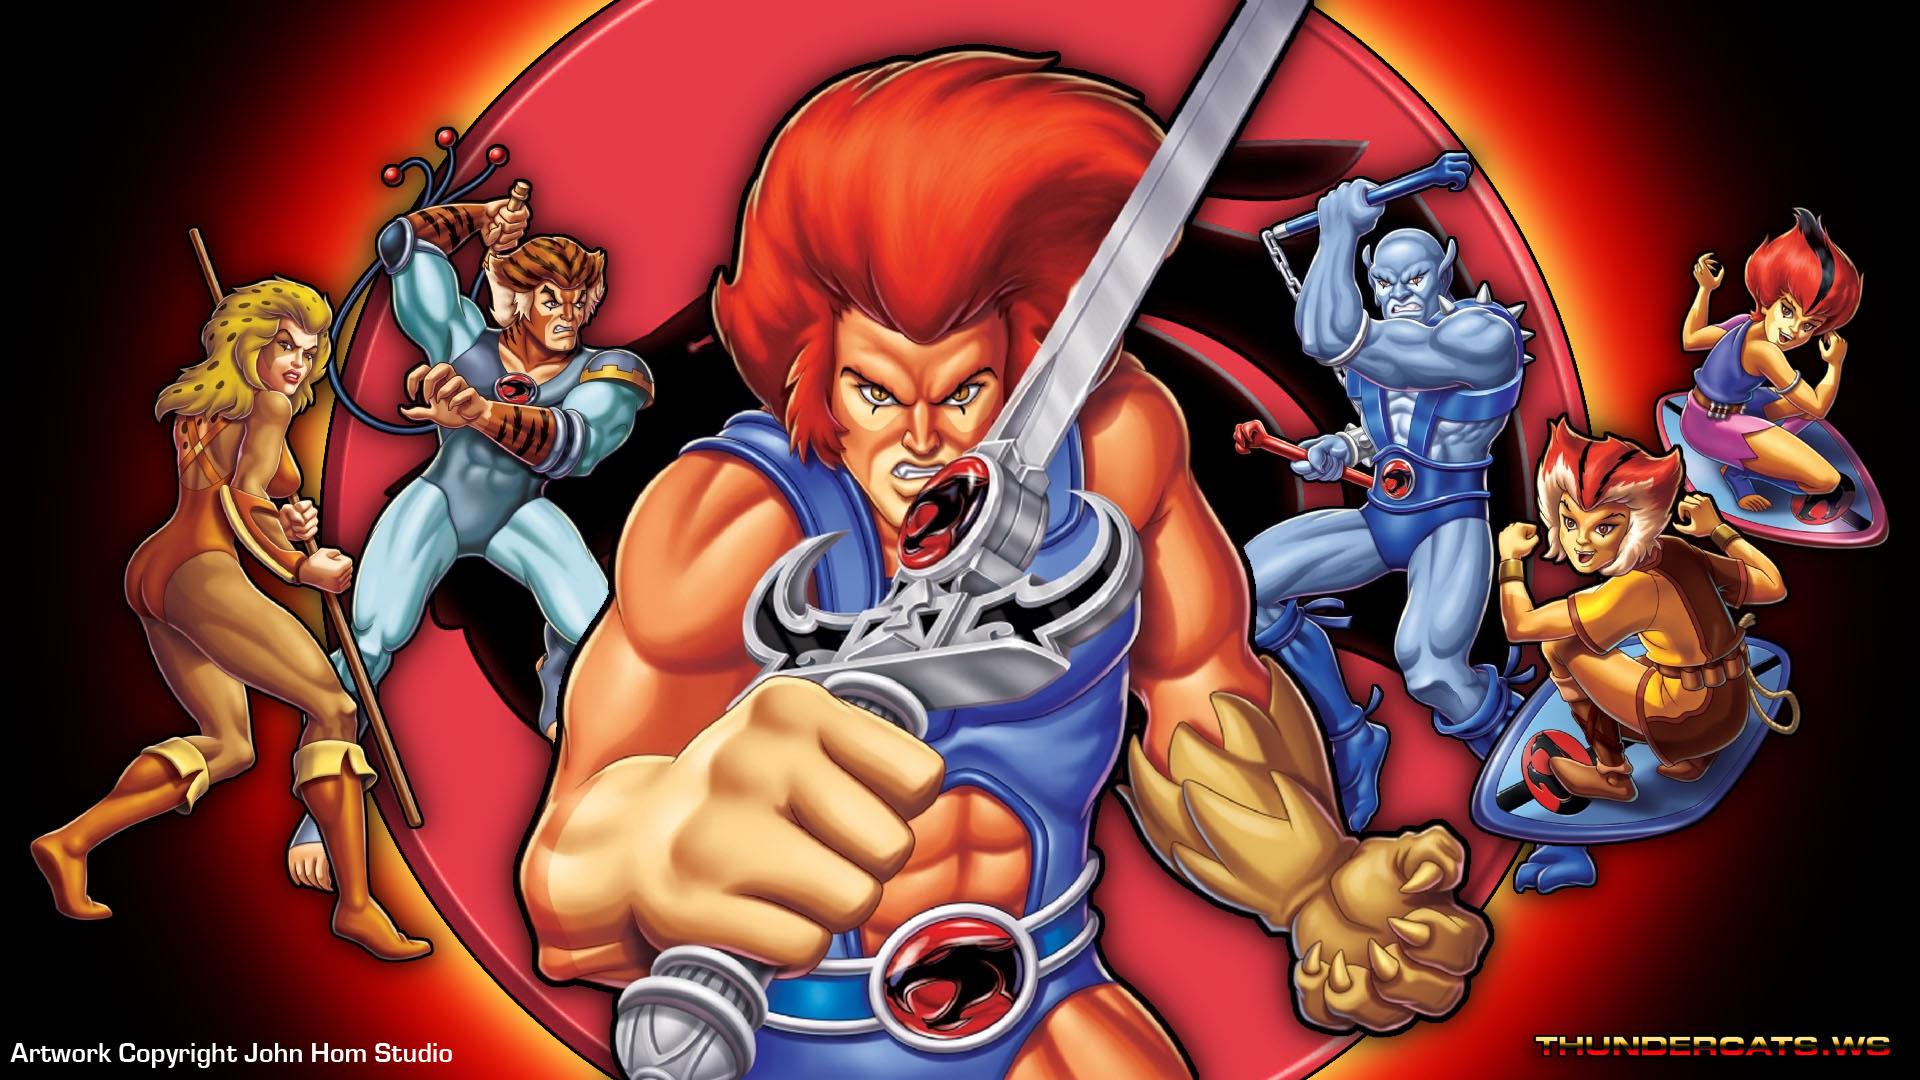 los thundercats caricaturas